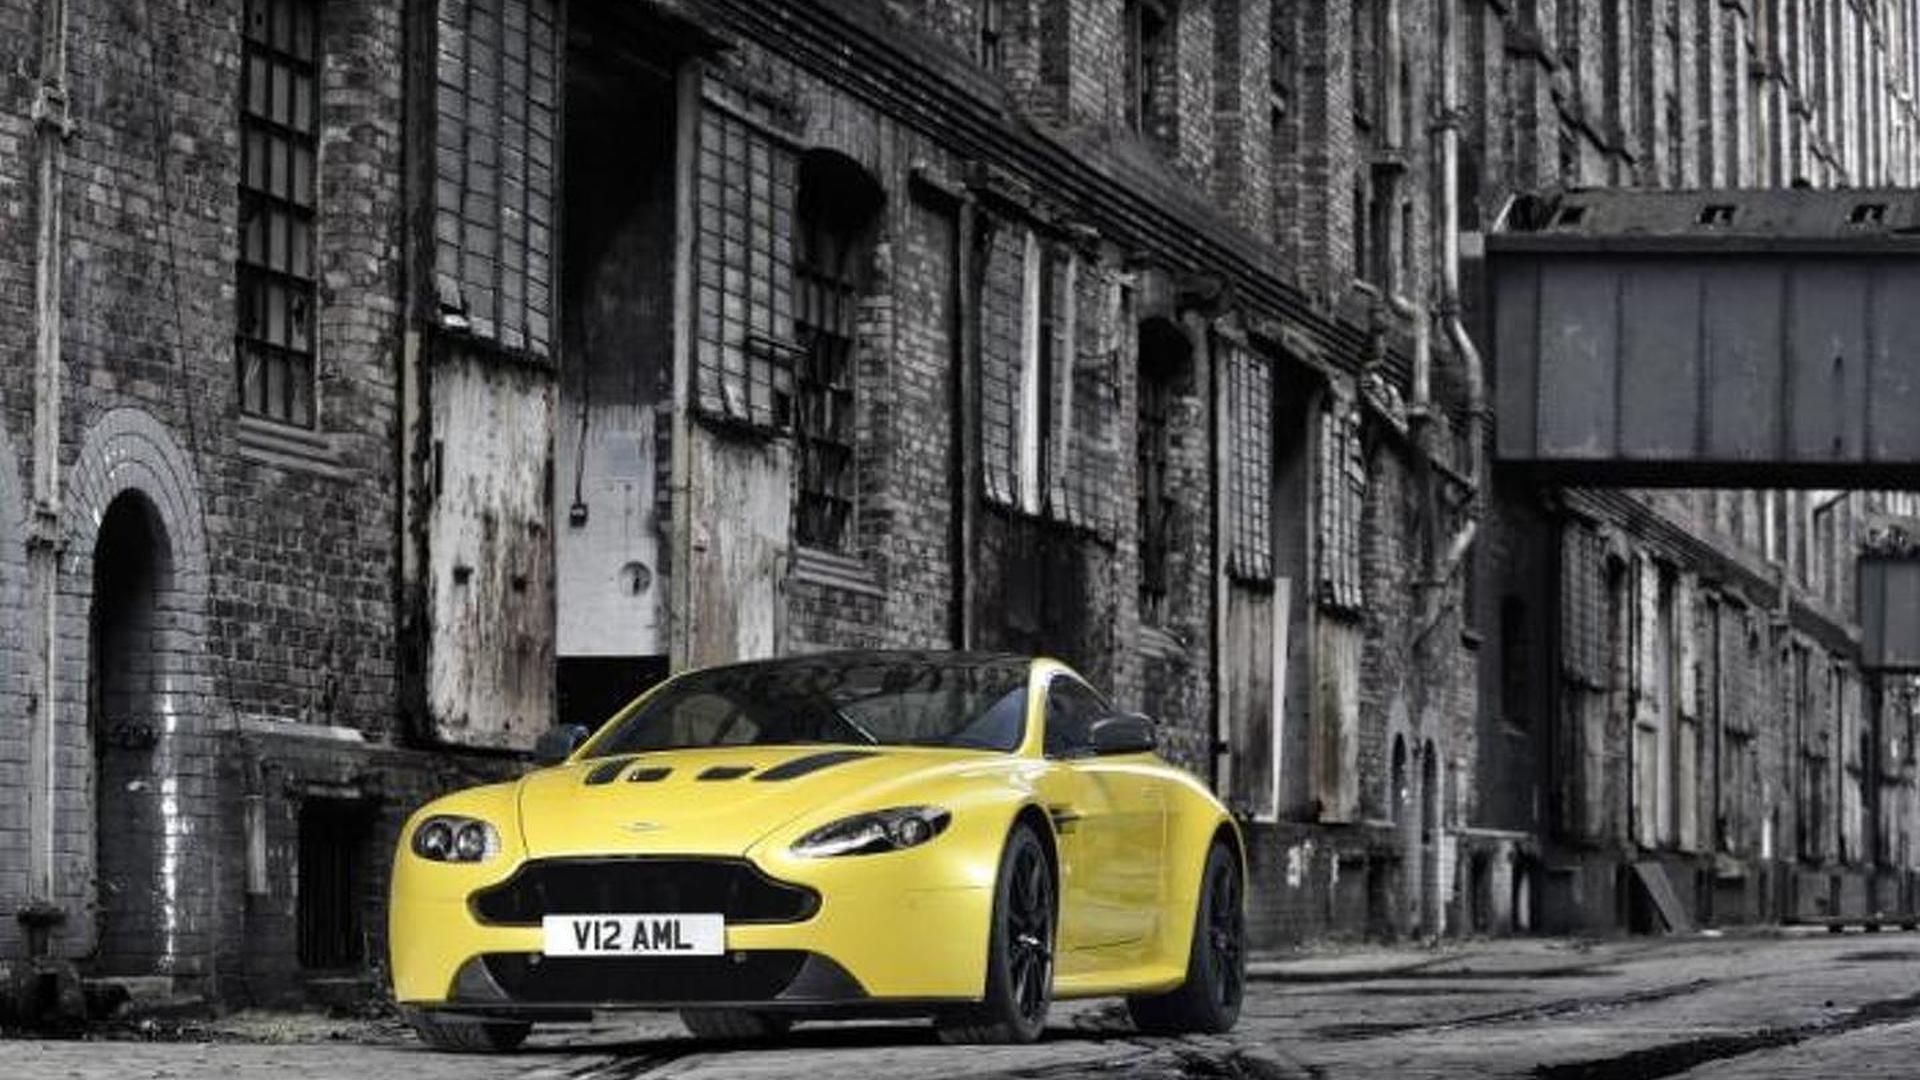 Aston Martin V12 Vantage S officially revealed [video]